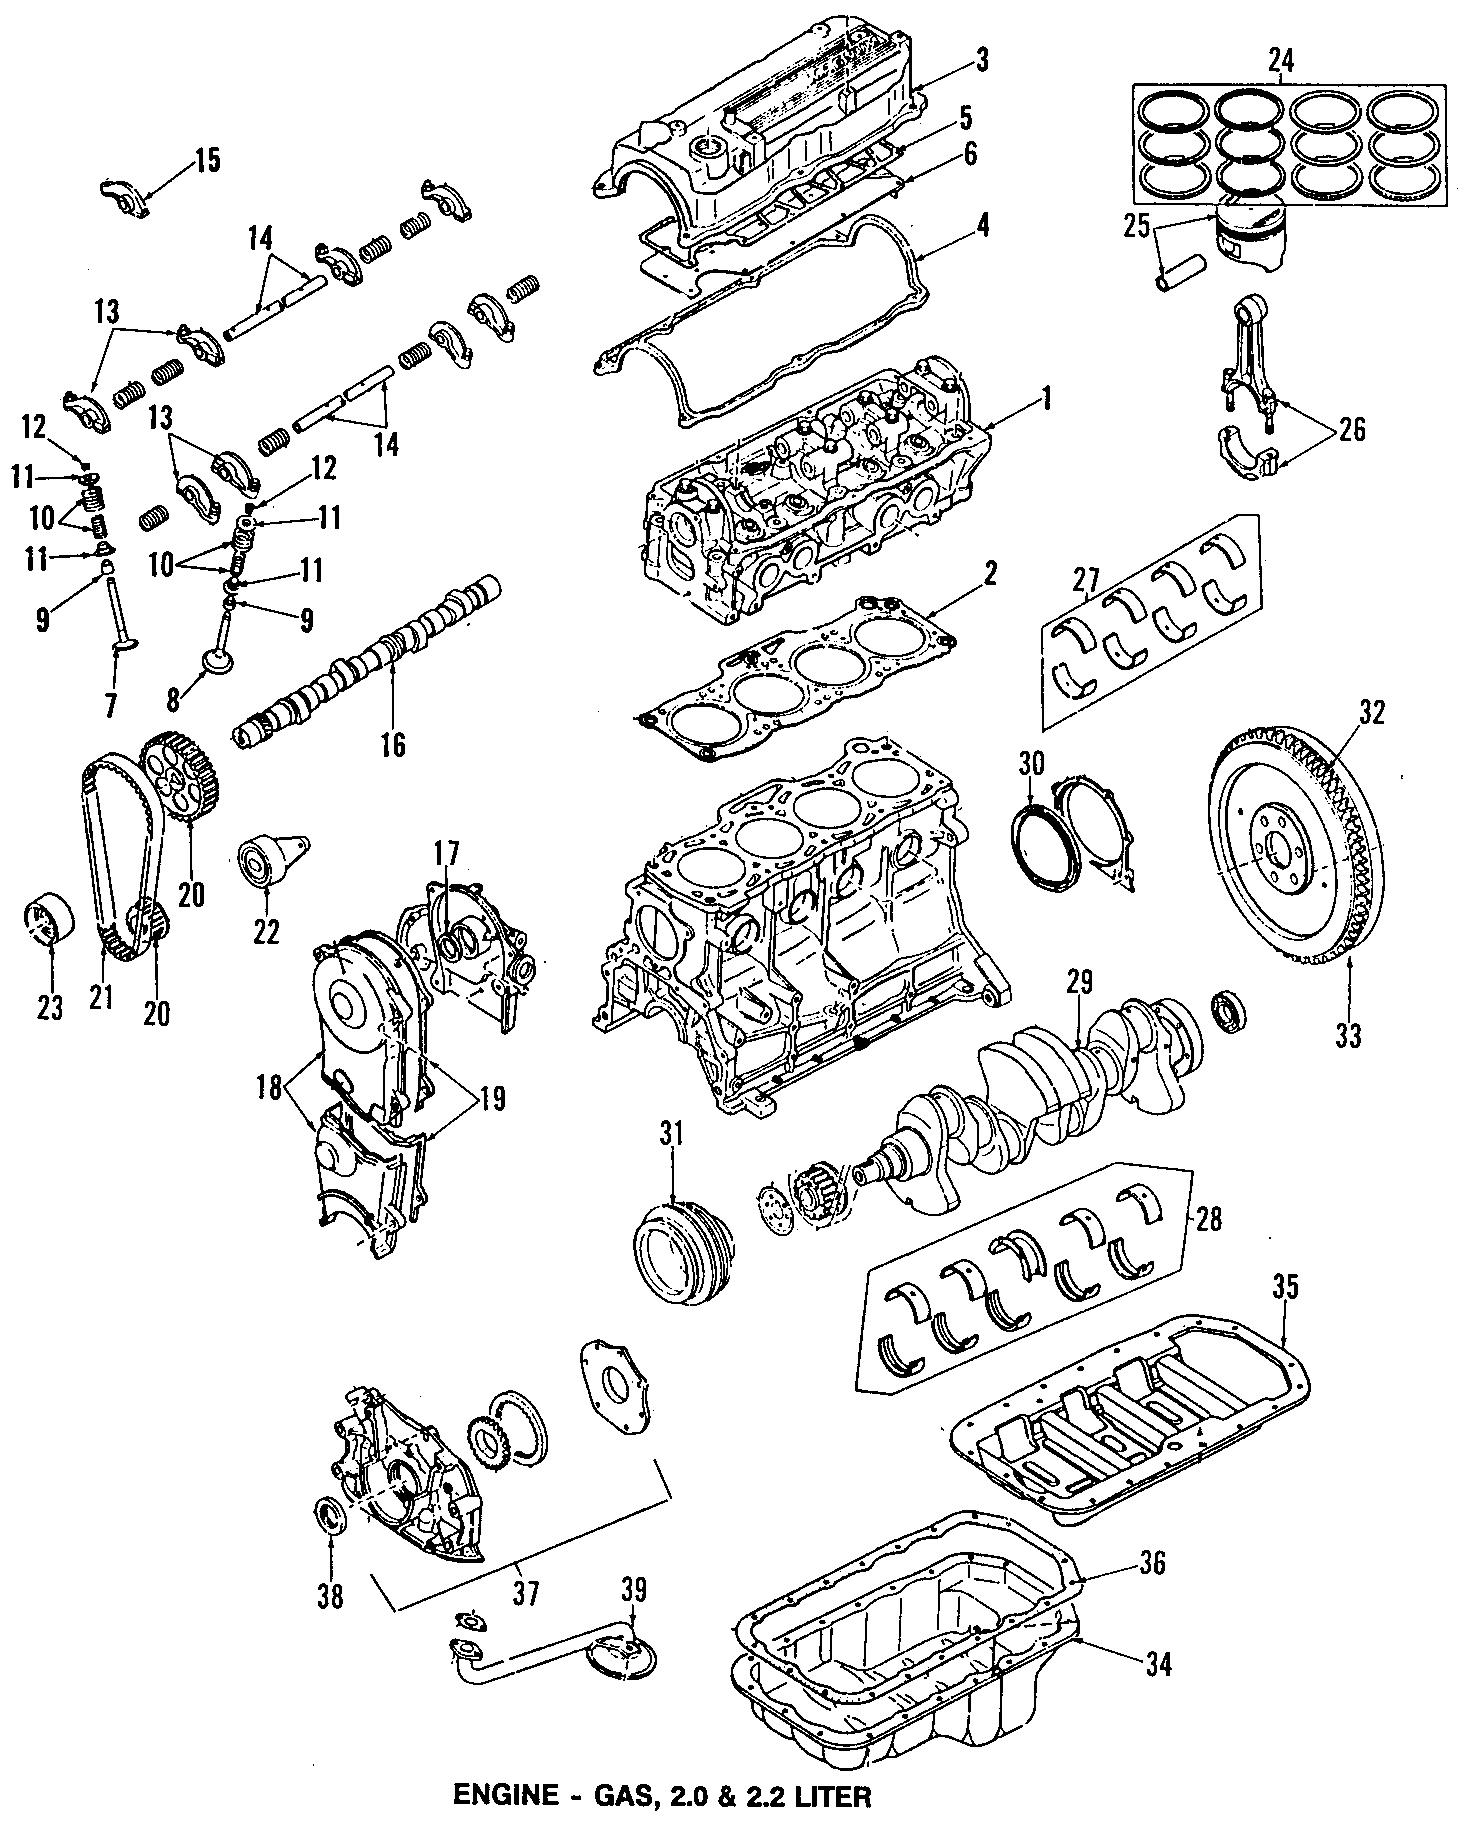 Mazda B Engine Timing Cover Gasket 2 2 Liter 626